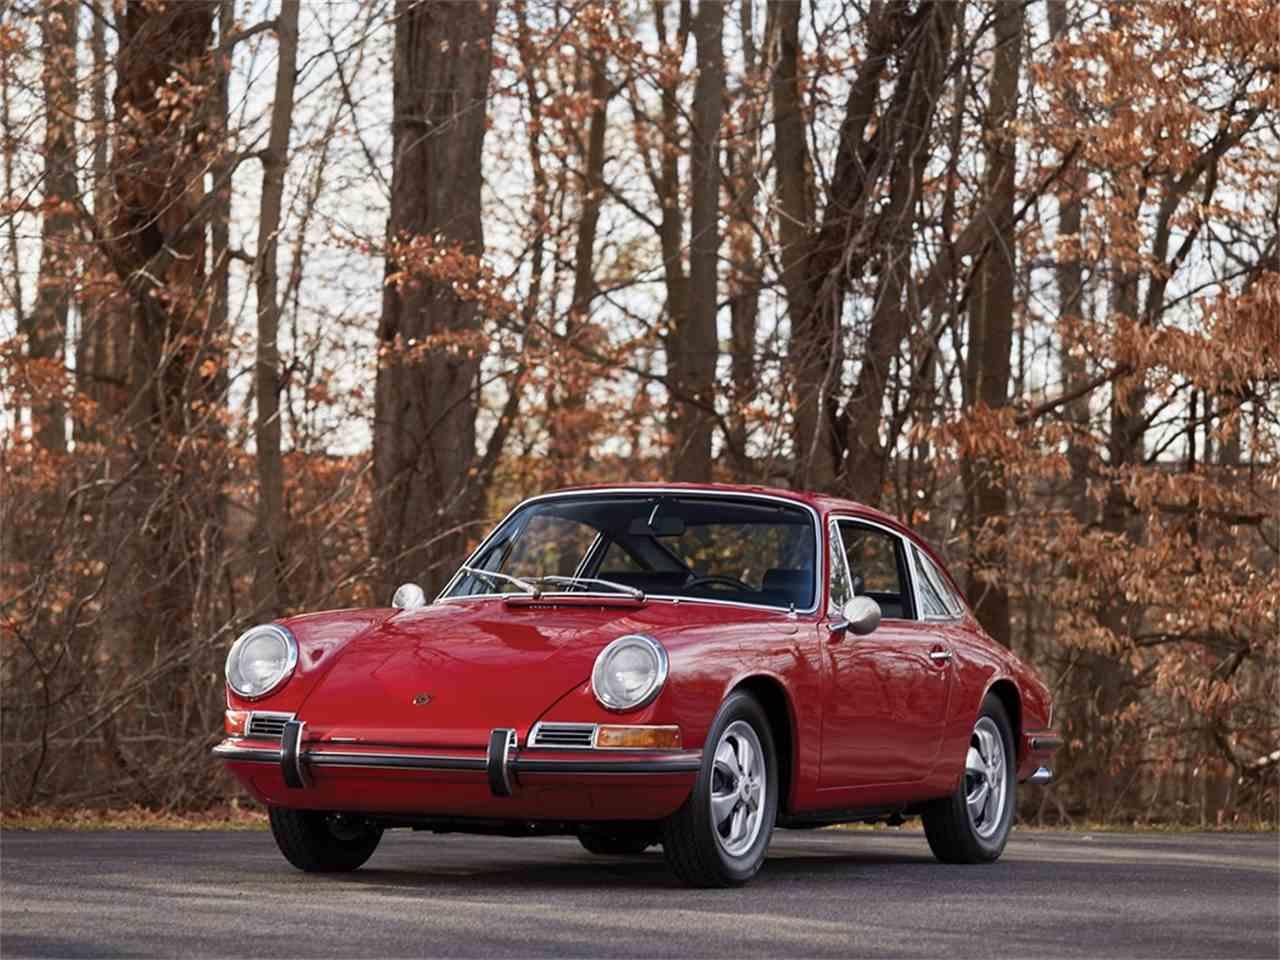 1967 Porsche 911S for Sale   ClassicCars.com   CC-1070601